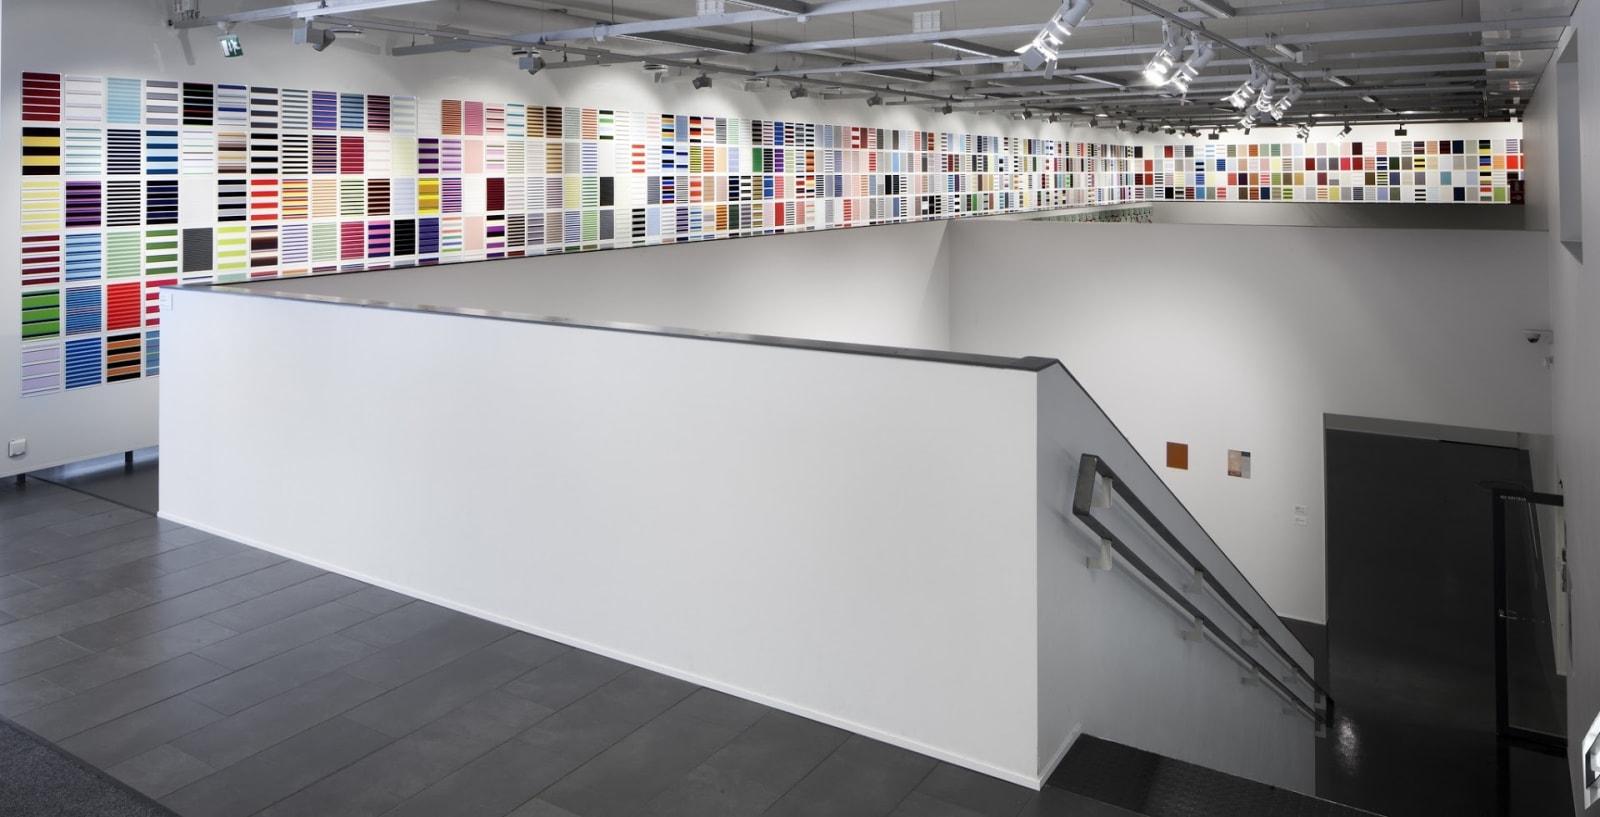 Jacob Dahlgren Installation view, Stripes and Coloured Circles, Art Museum Centre Sinkka, Kervo, Finland, 2015